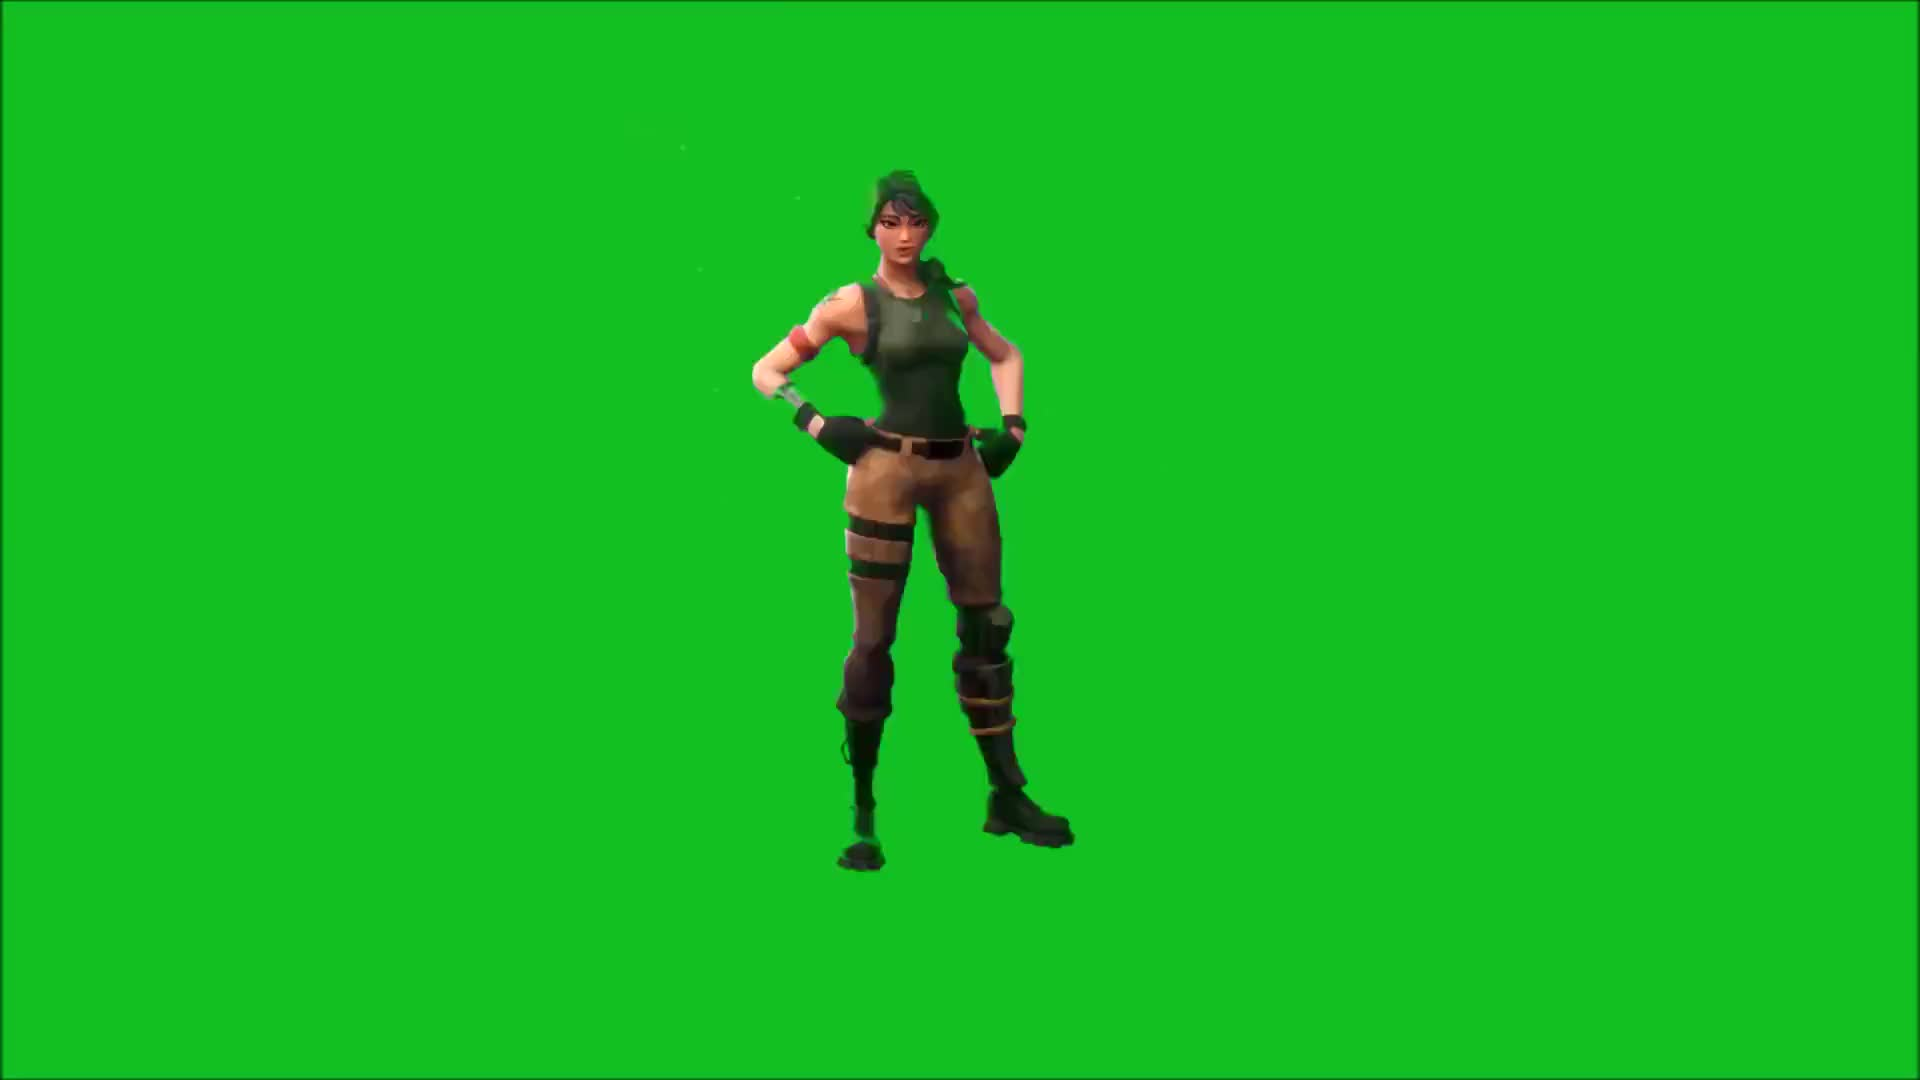 Basic Fortnite Dance Greenscreen